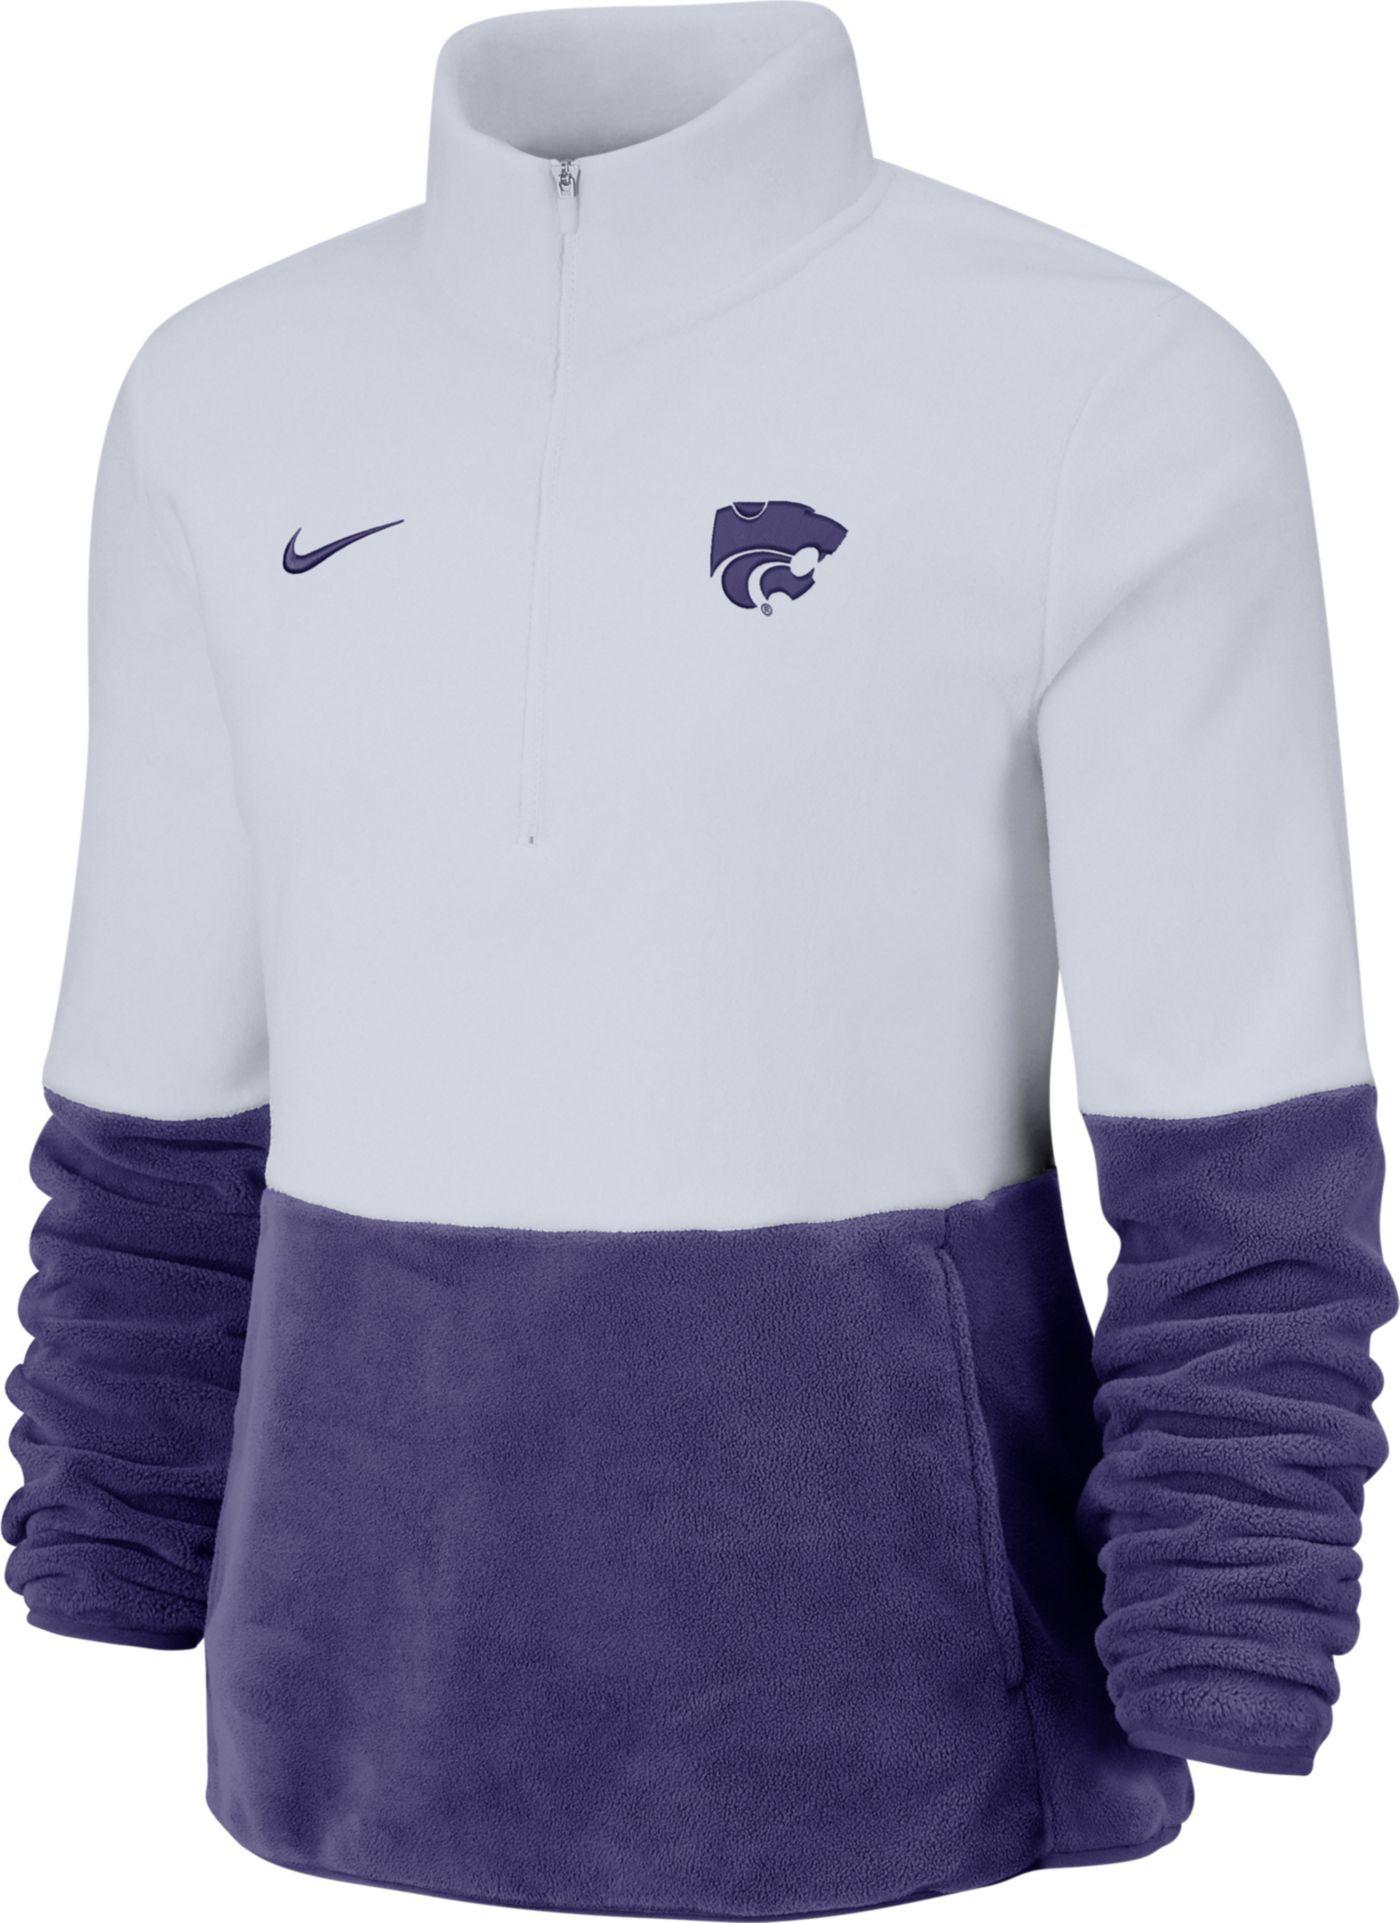 Nike Women's Kansas State Wildcats Cozy Therma White Half-Zip Fleece